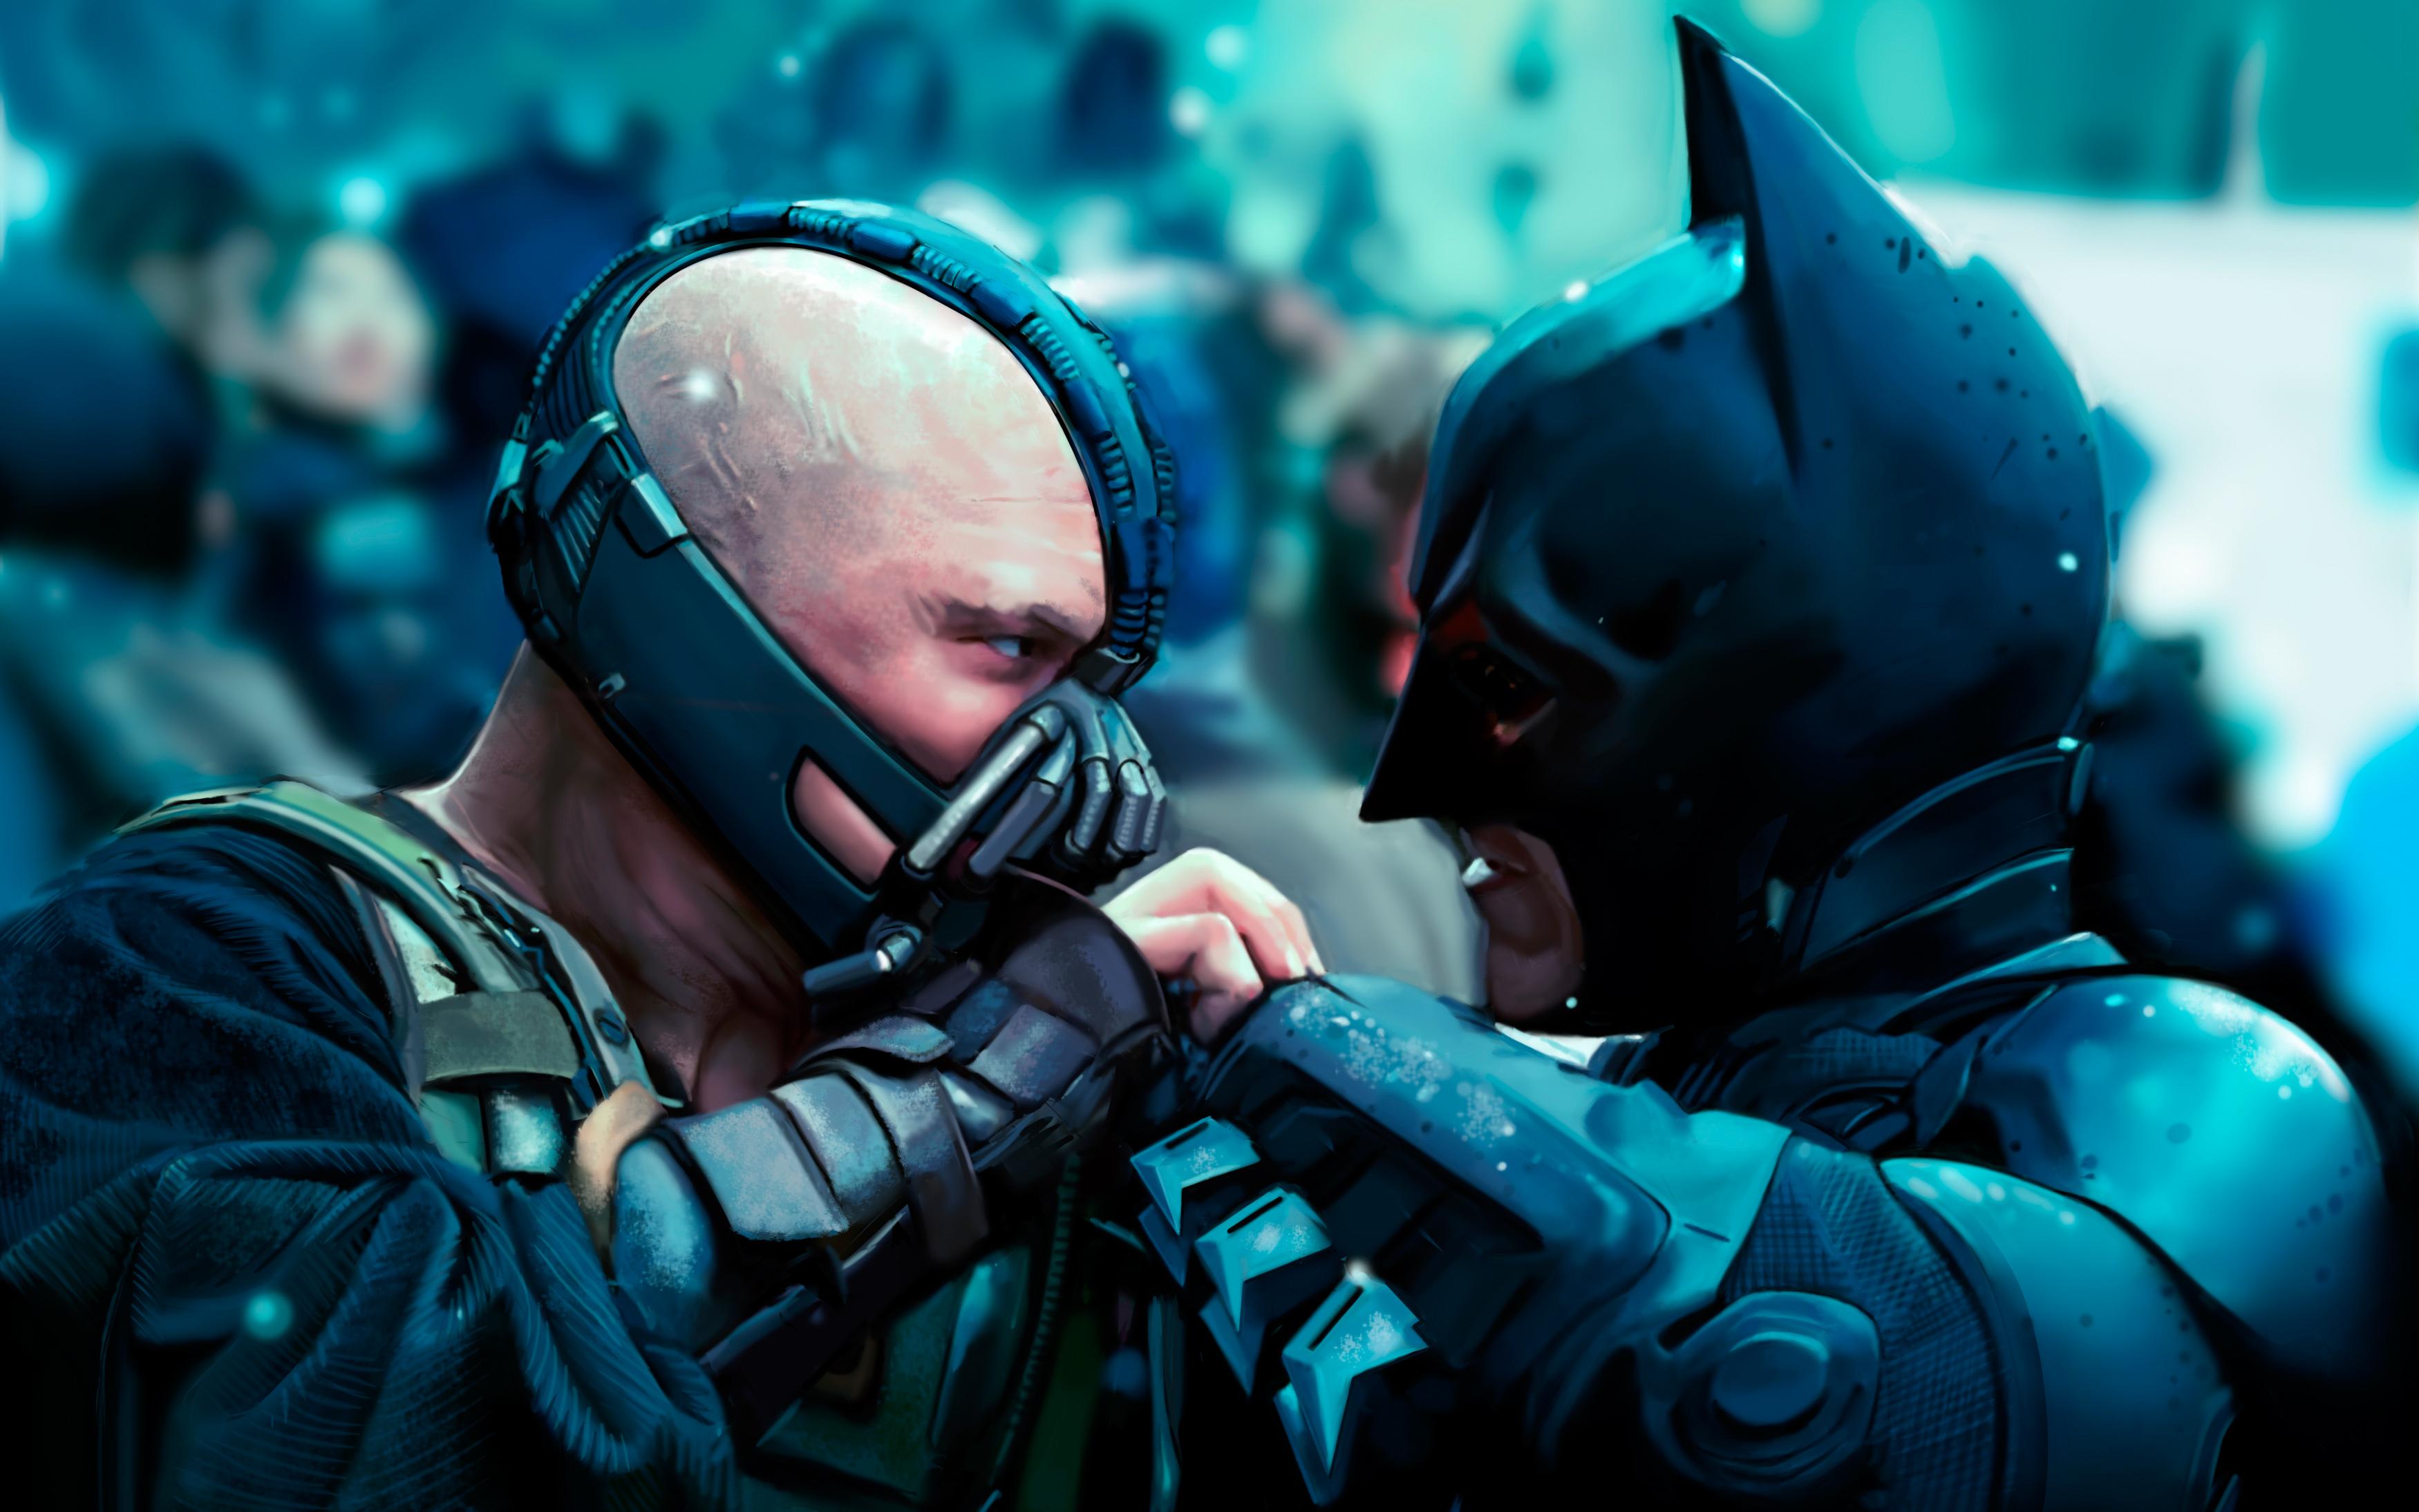 Bane Batman Dark Knight Rises Wallpaper